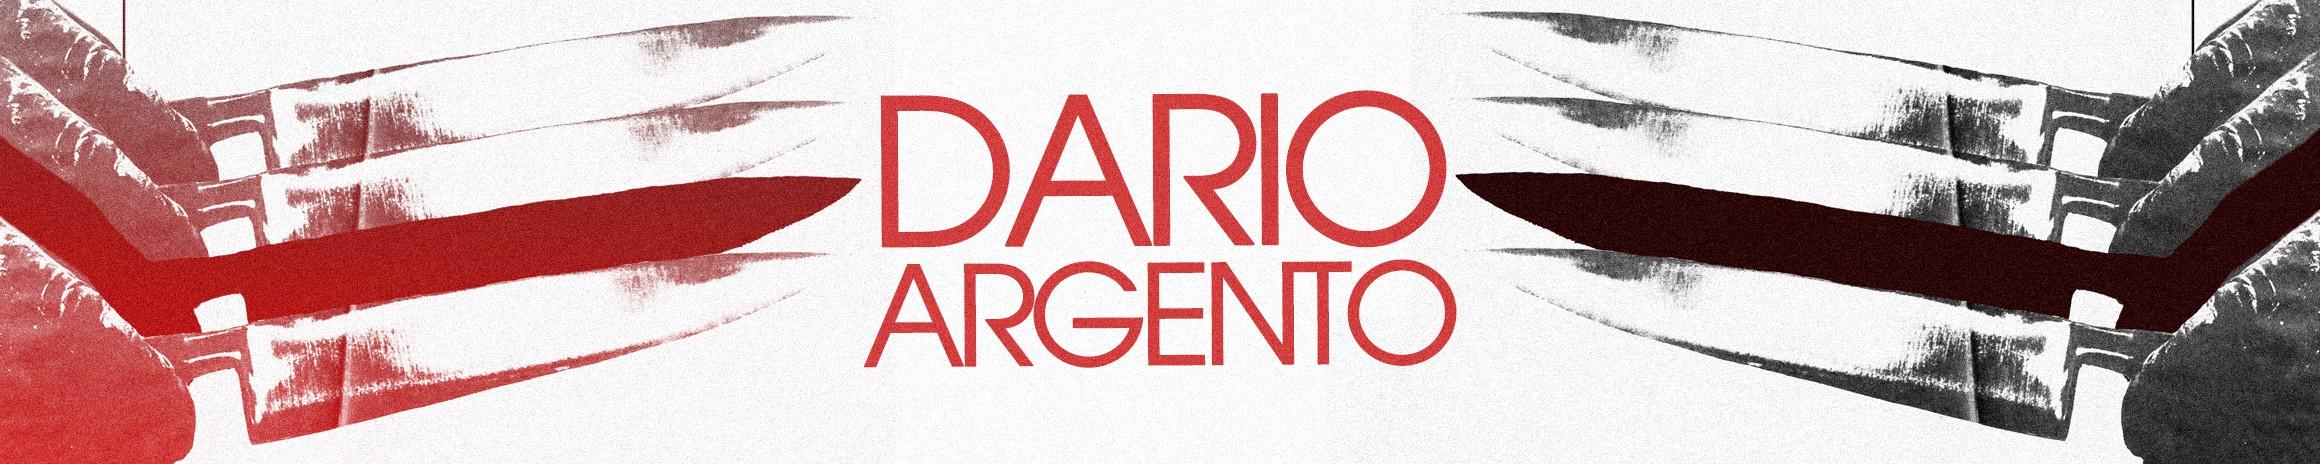 DARIO ARGENTO - NEW RESTORATIONS